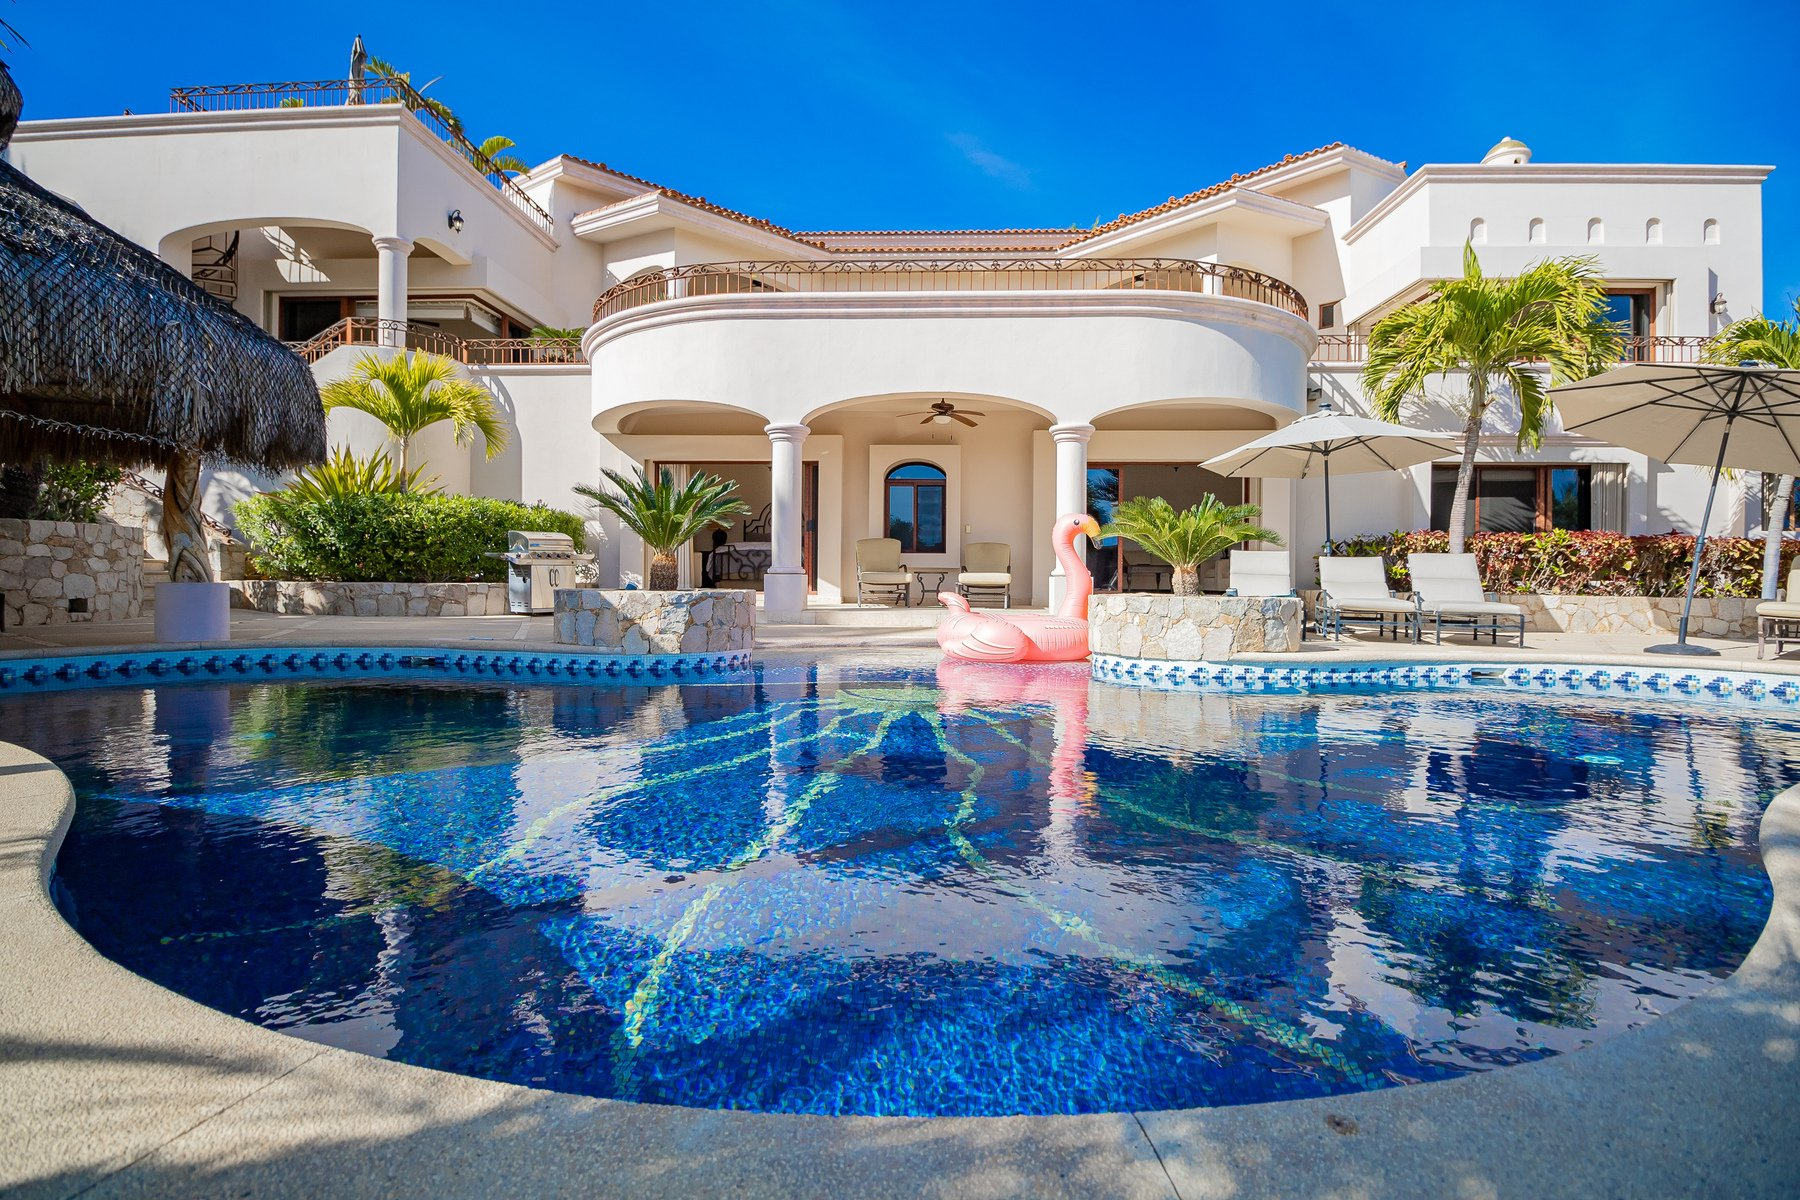 House in Baja California Sur, Mexico 1 - 11342923